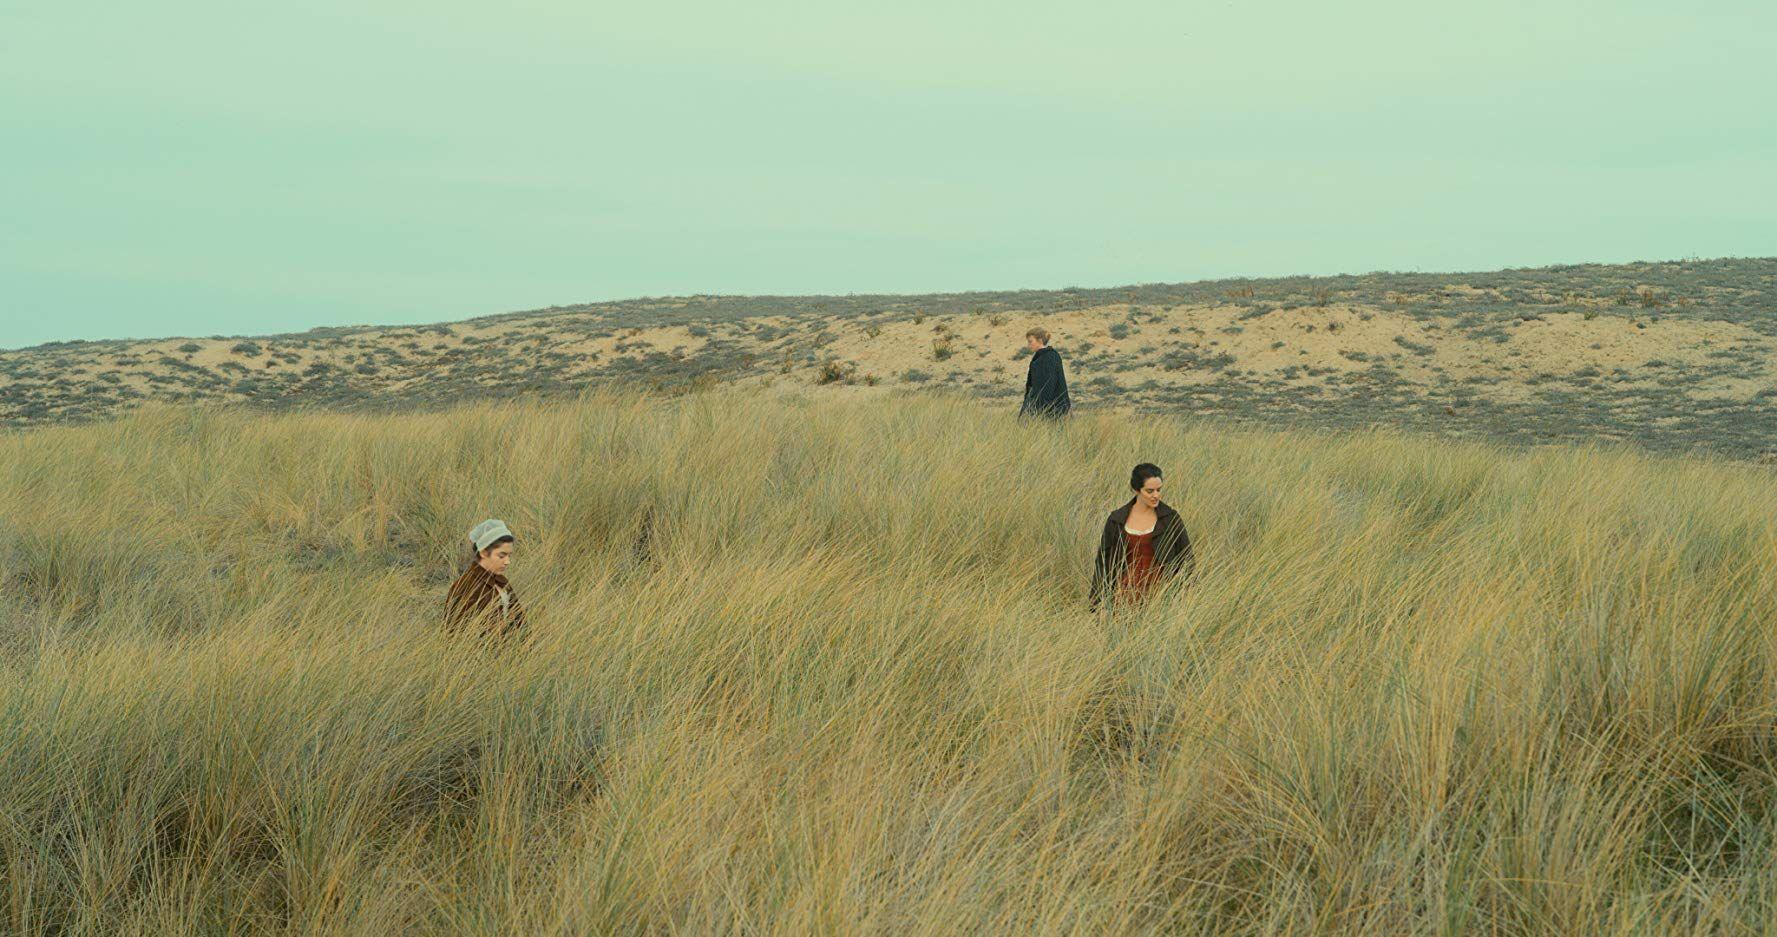 123movies Portrait Of A Lady On Fire 2019 Full Movie Online Free Beautiful Film Film Stills Movie Shots